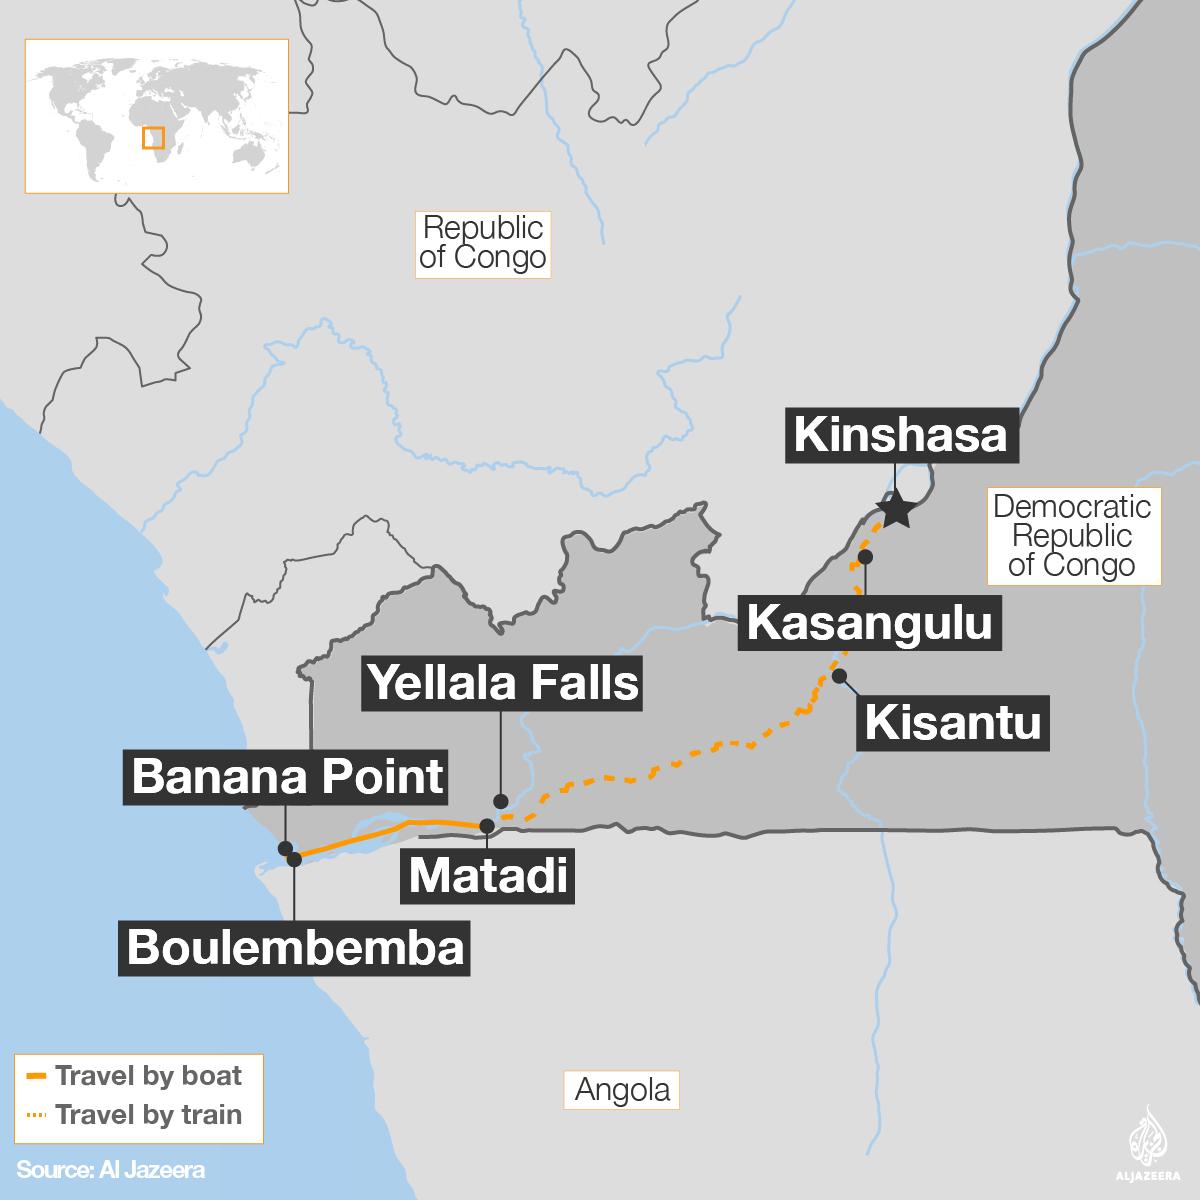 The Atlantic to Kinshasa: A journey on the River Congo   DR ... on congo river, addis ababa, africa map, kampala map, kuala lumpur map, nairobi map, mogadishu map, praia map, brazzaville map, cairo map, malabo map, kigali map, leopoldville map, maputo map, lagos map, abidjan map, cape town map, timbuktu map, congo map, dar es salaam, cape town, luanda map, freetown map, yaounde map,